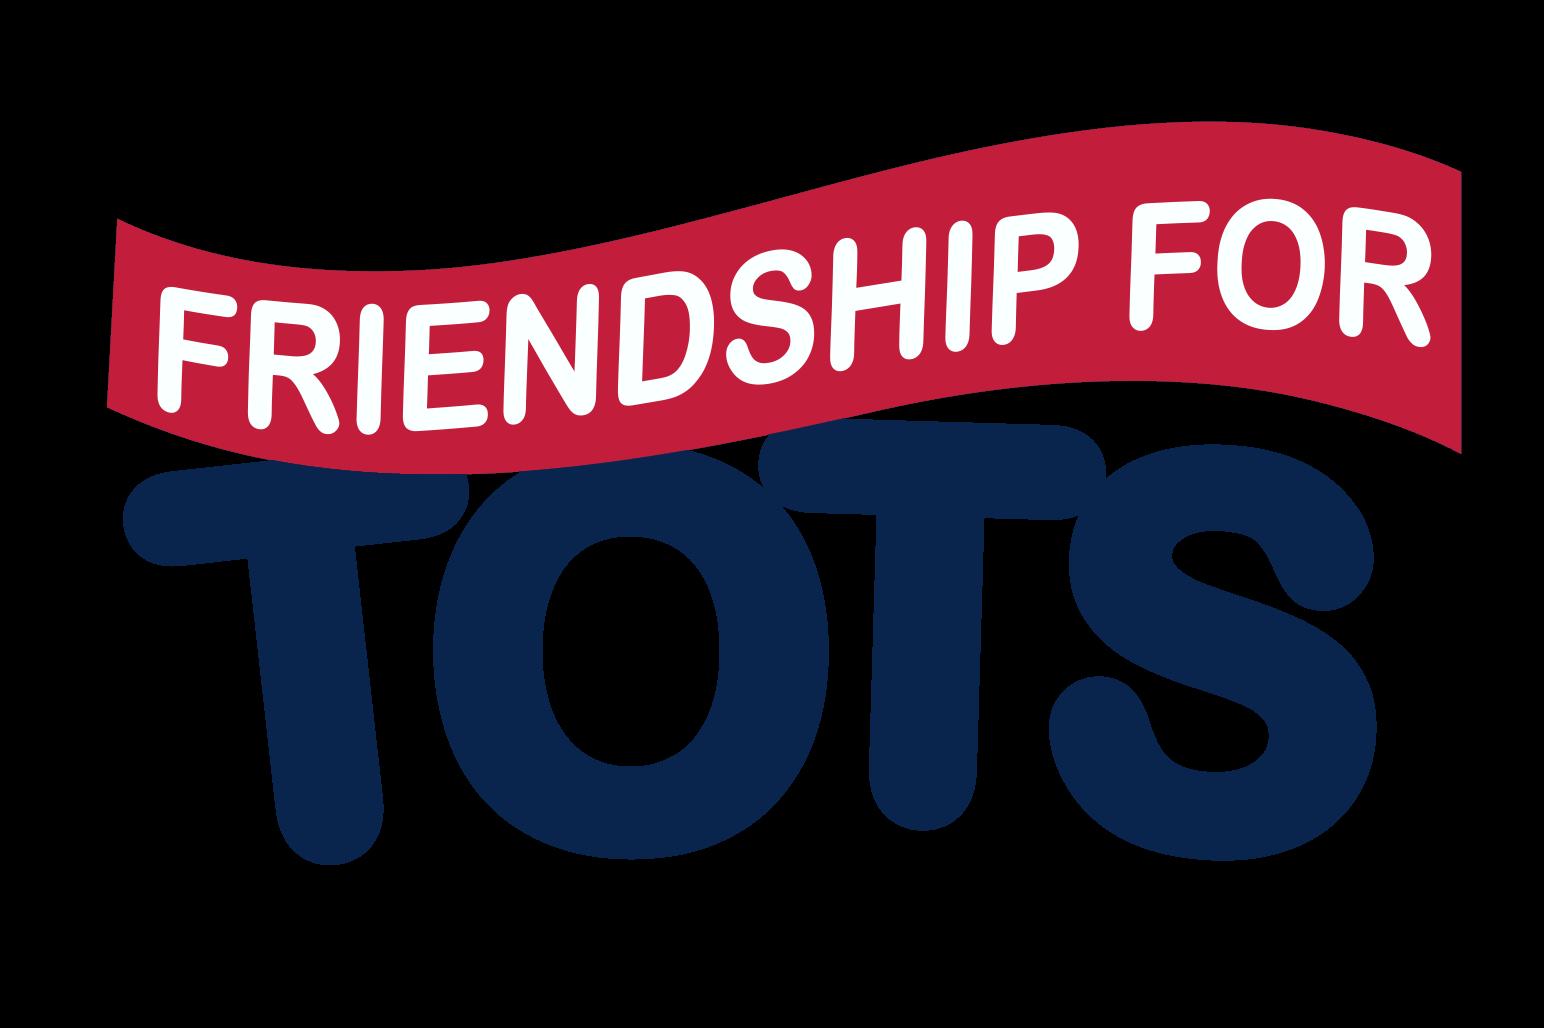 FTOTS GIRLS PREK